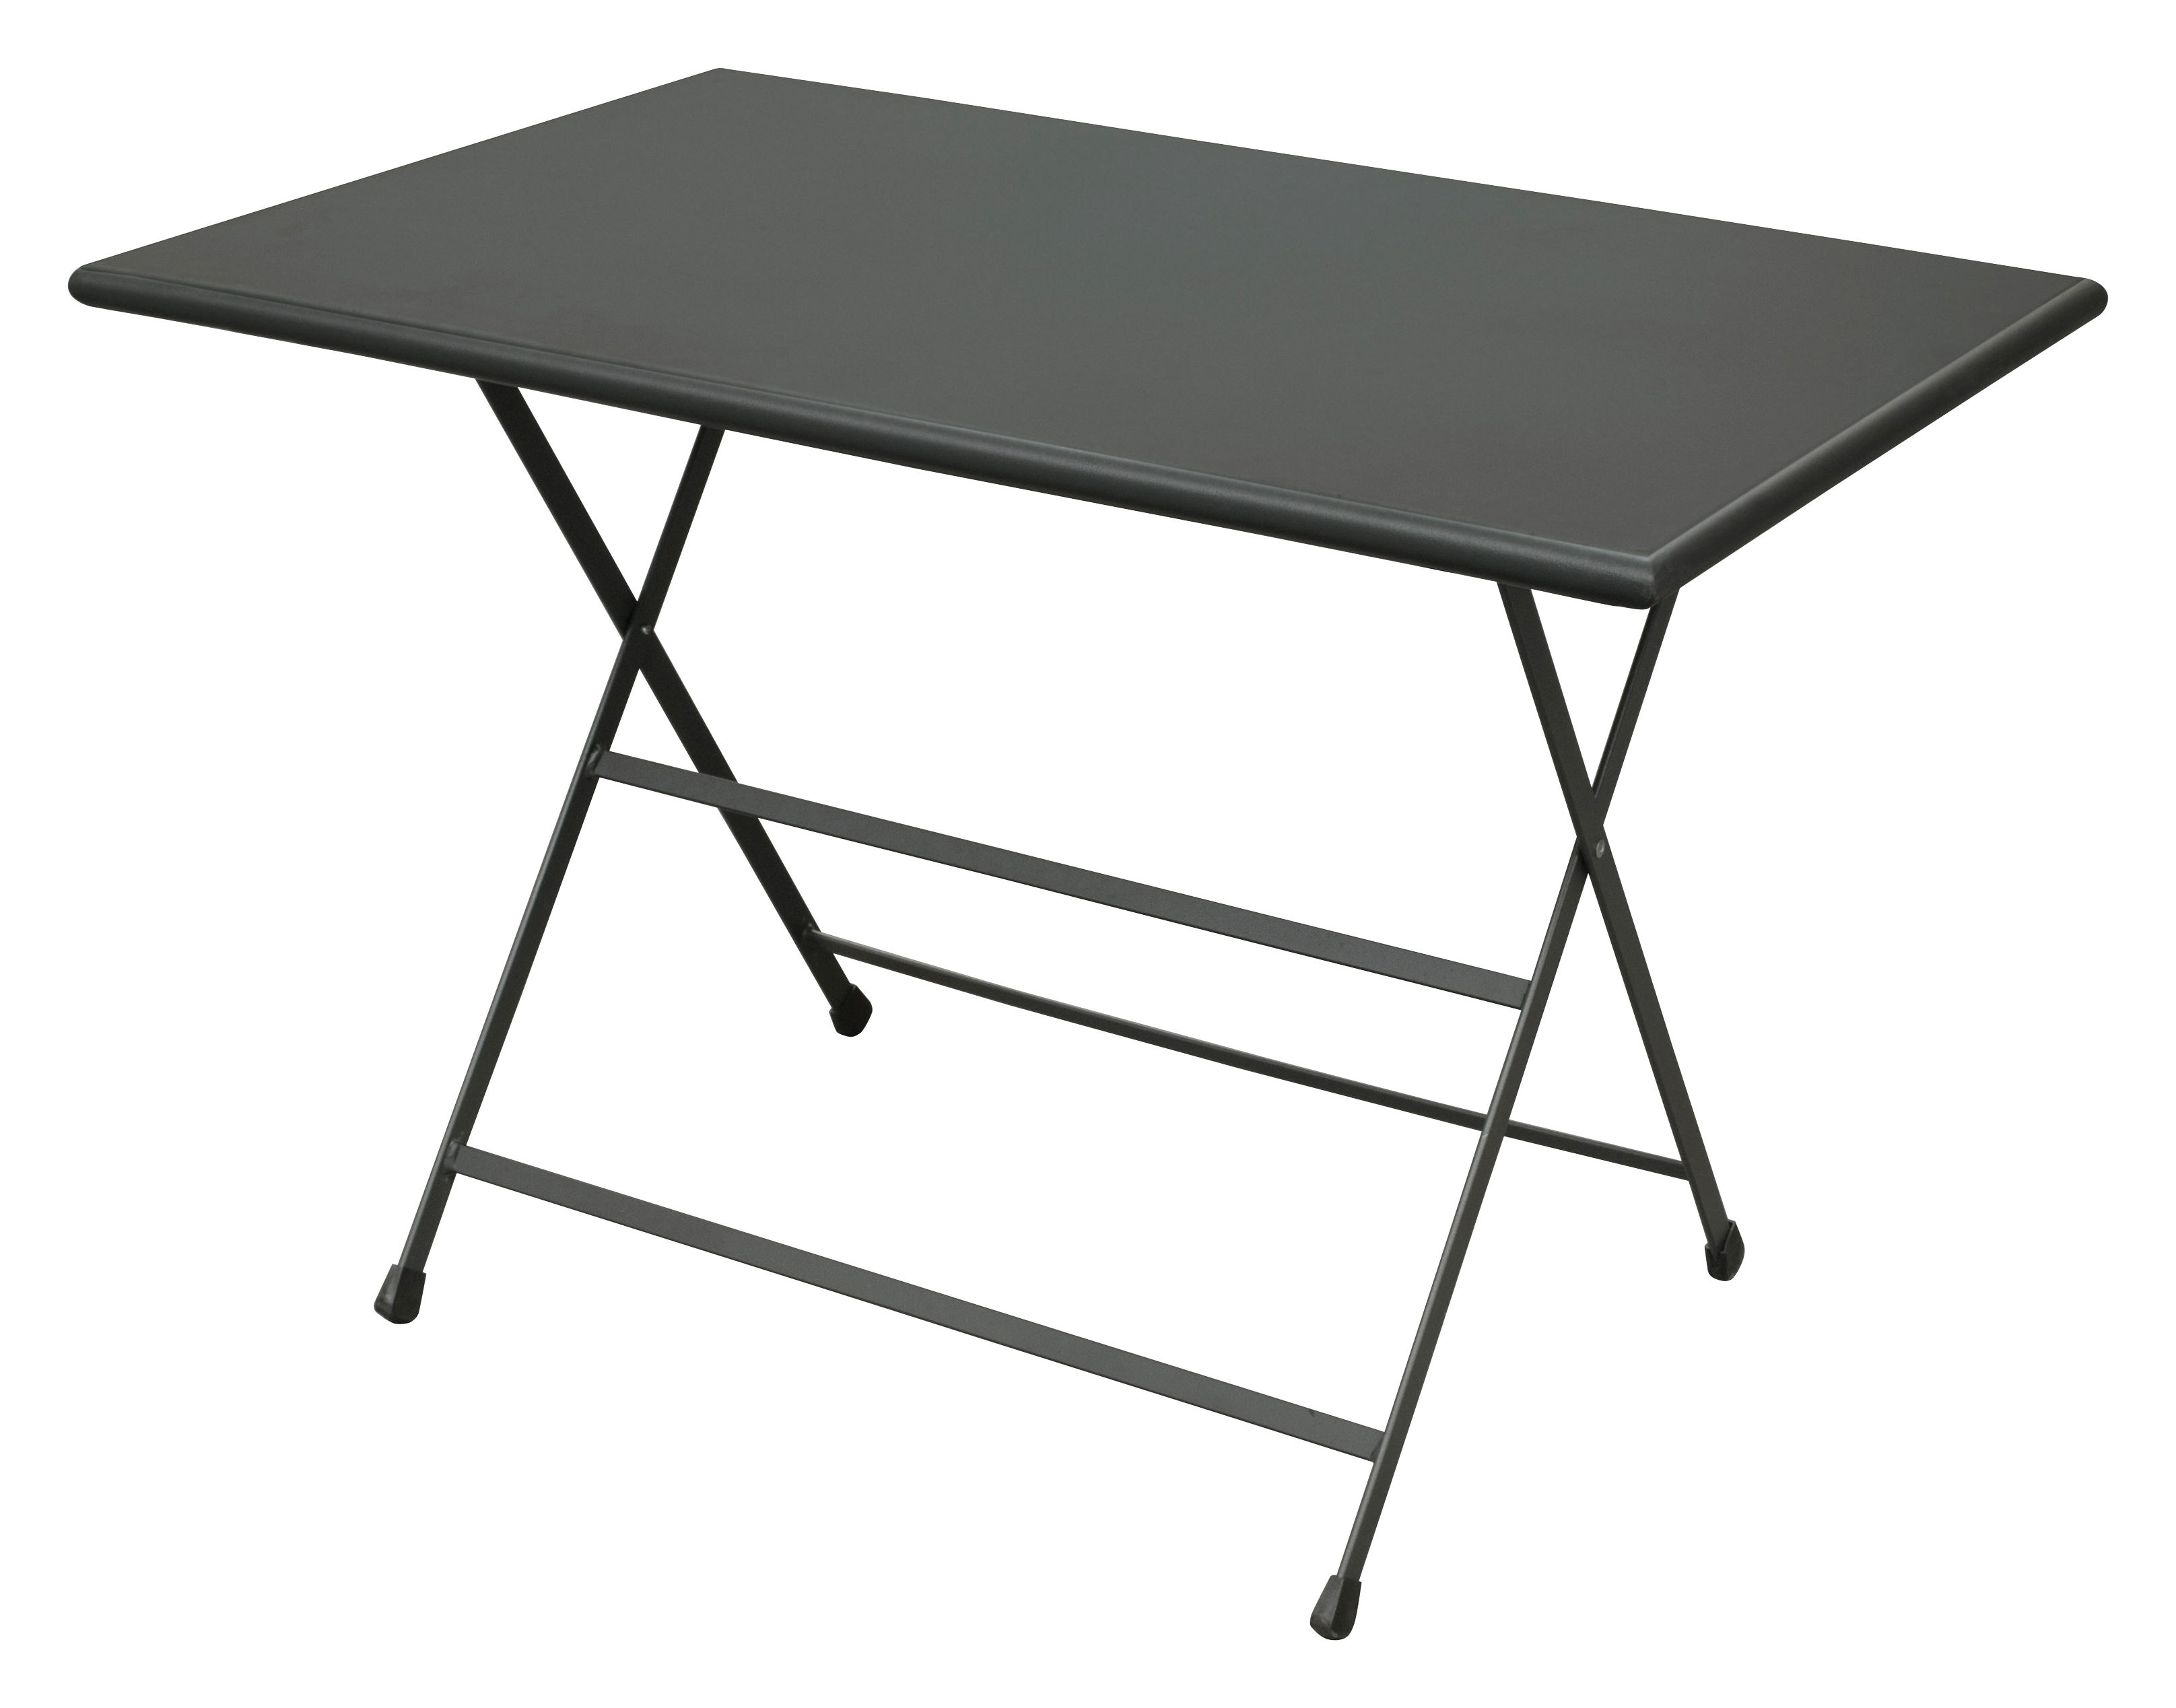 Jardin - Tables de jardin - Table pliante Arc en Ciel / 110 x 70 cm - Emu - Fer ancien - Acier inoxydable verni